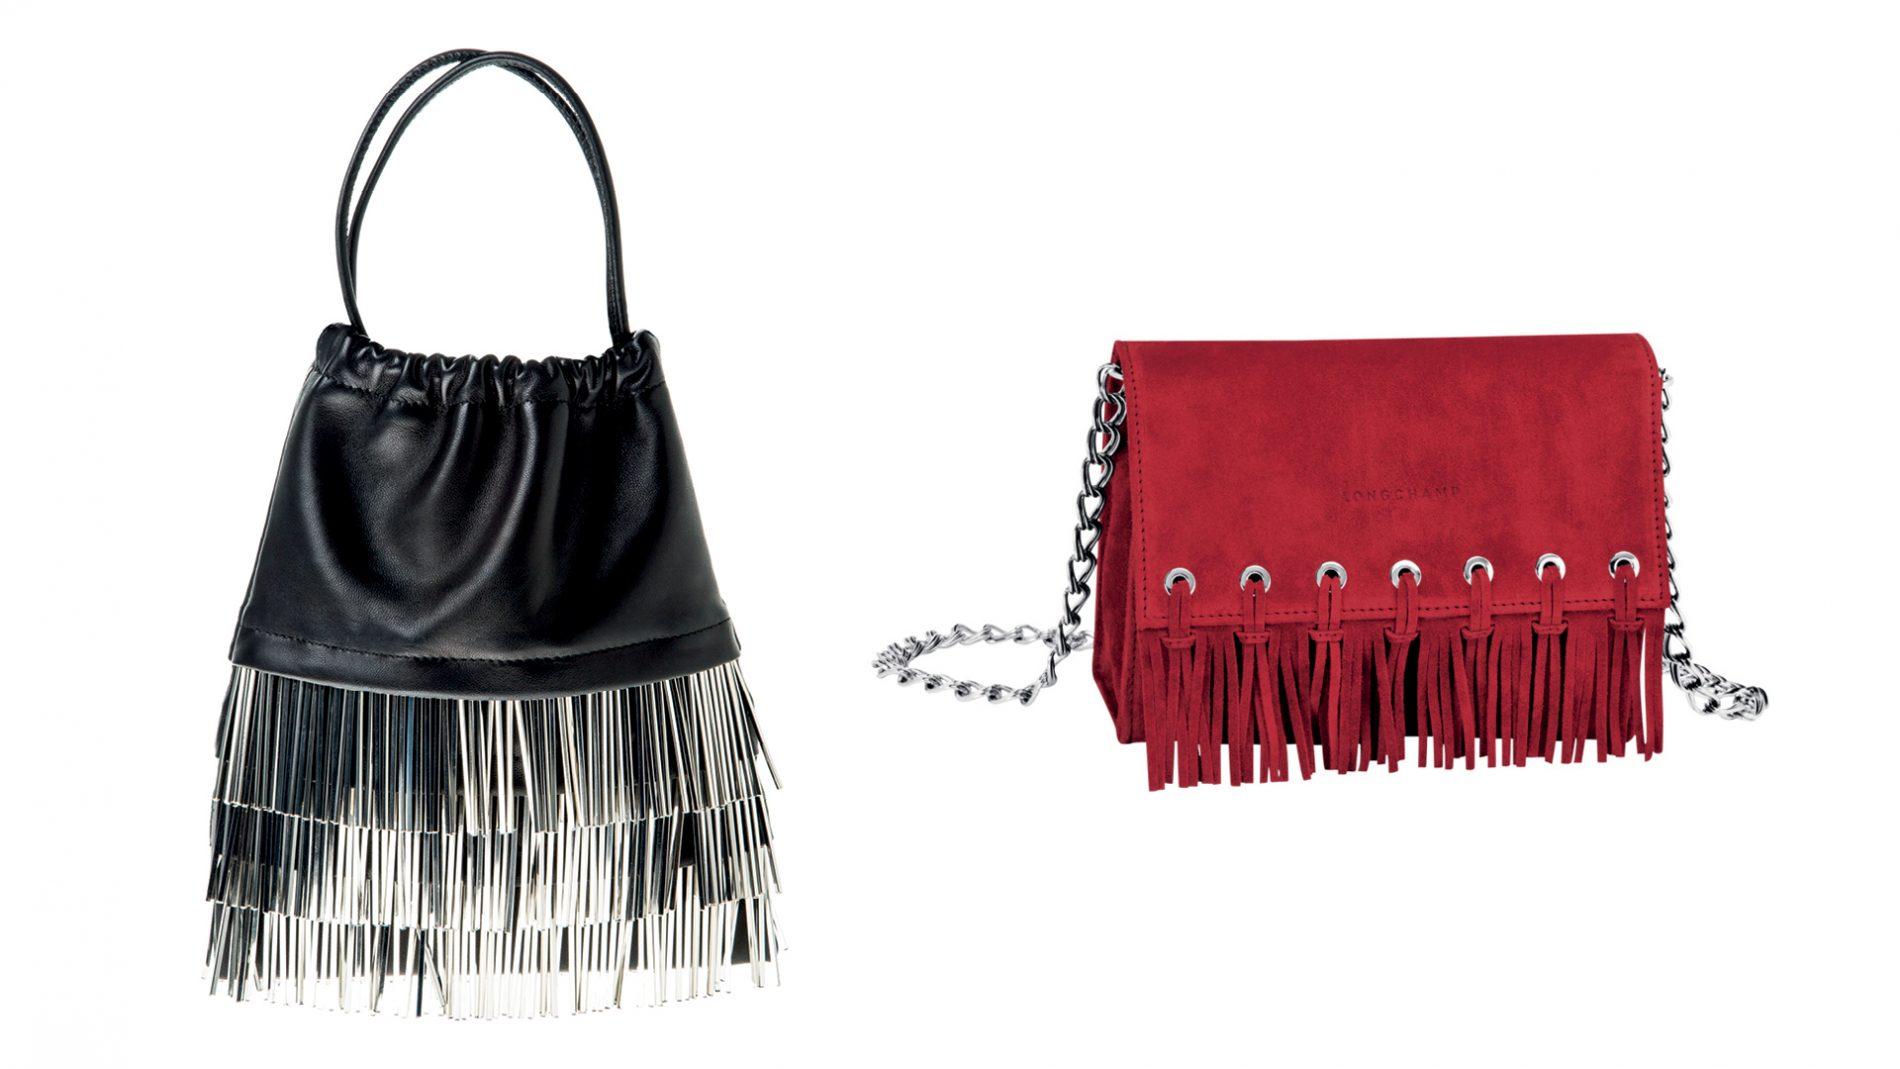 El Corte Inglés Designer Hangbags Alexander Wang Longchamp Fringe